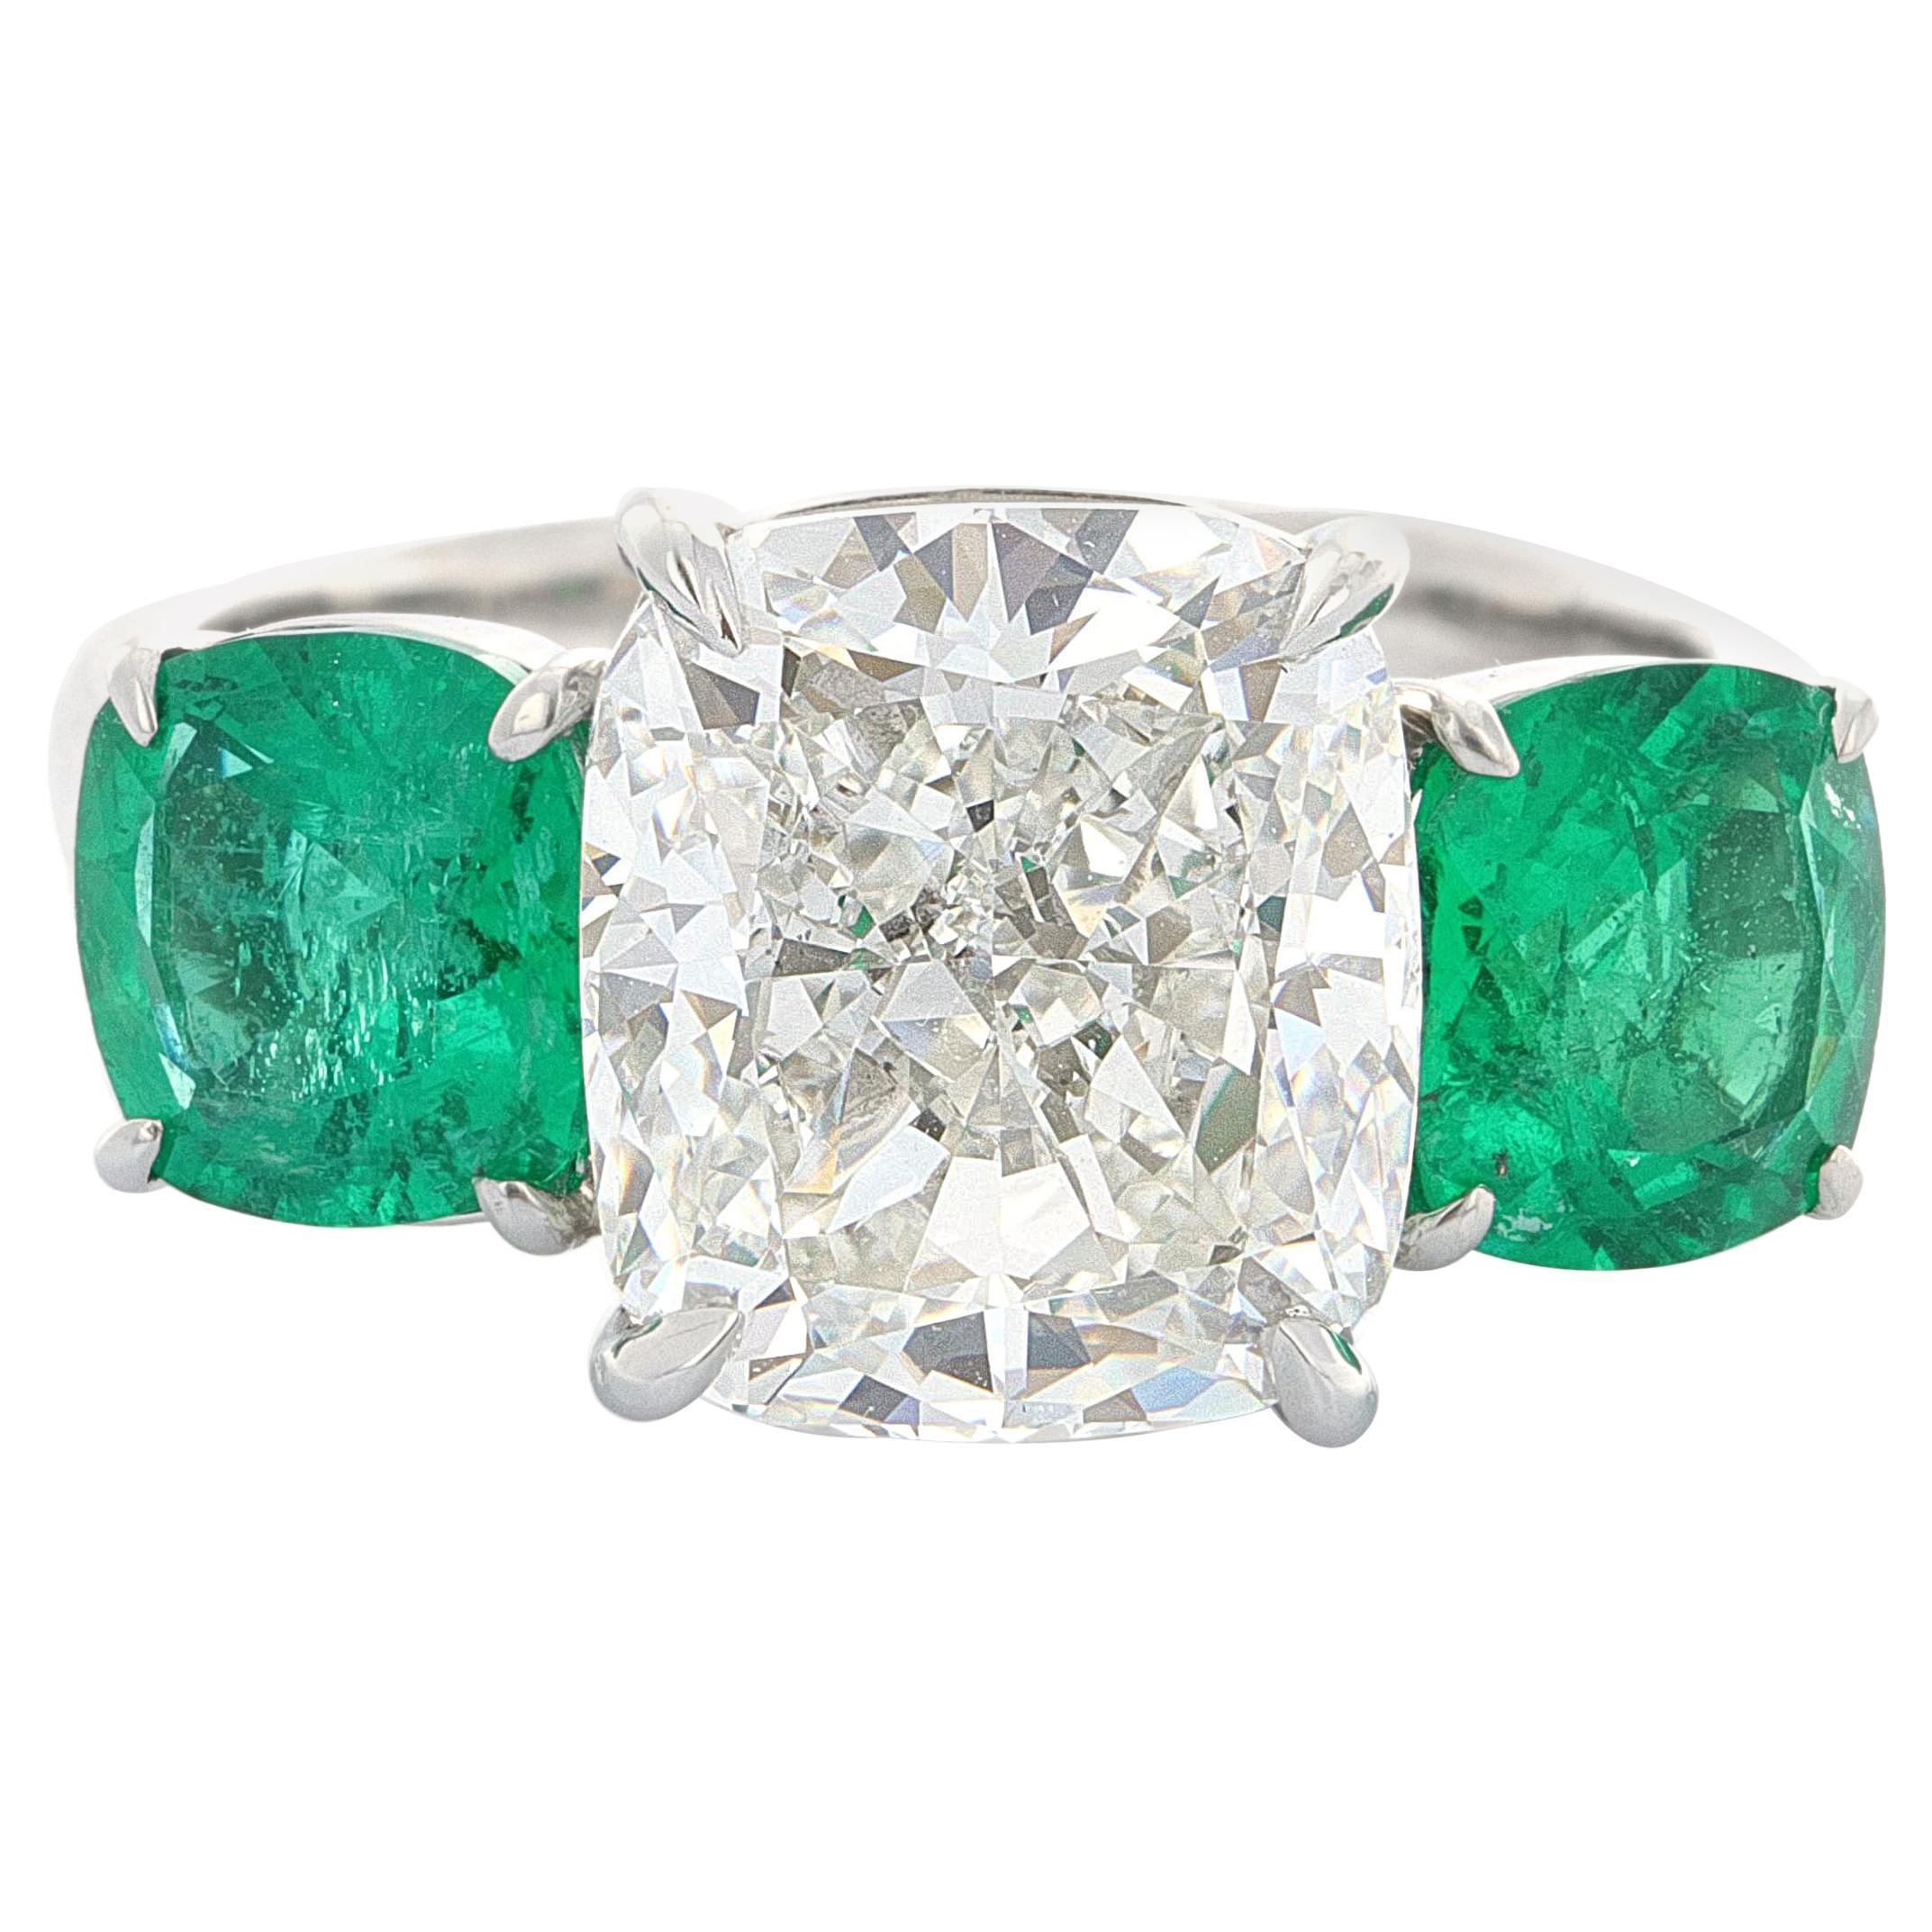 GIA Certified, Three-Stone Diamond and Emerald Ring